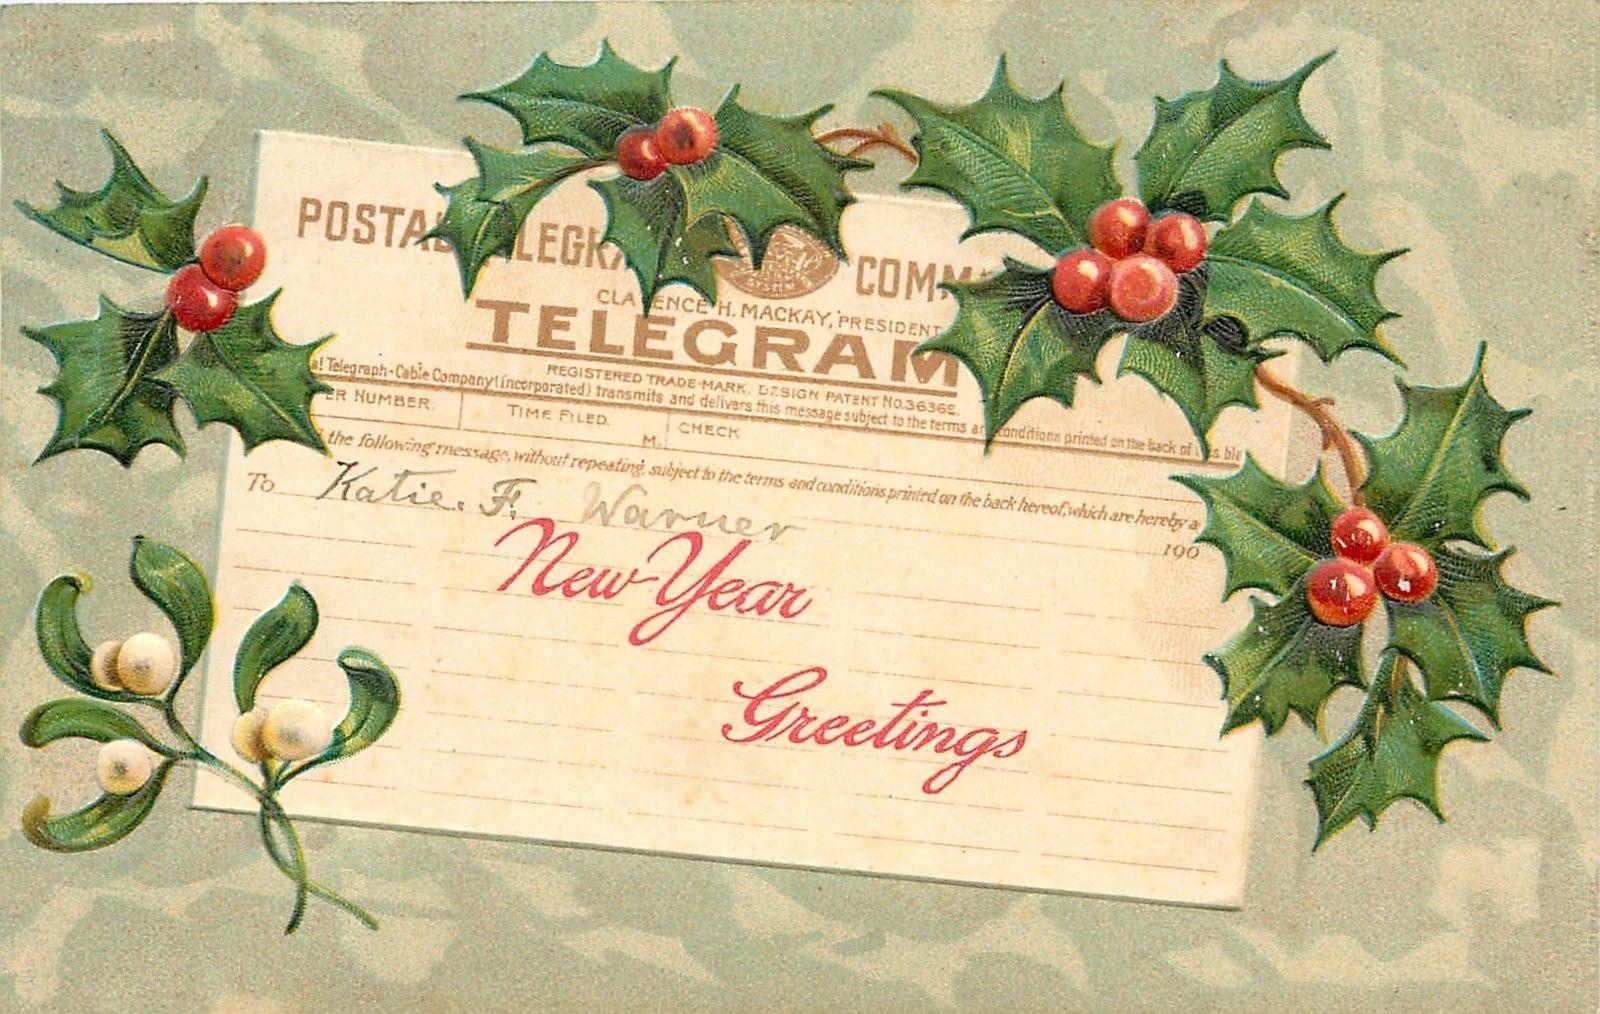 new year postal telegram message greeting mistletoe holly berry mint emboss pfb ebay